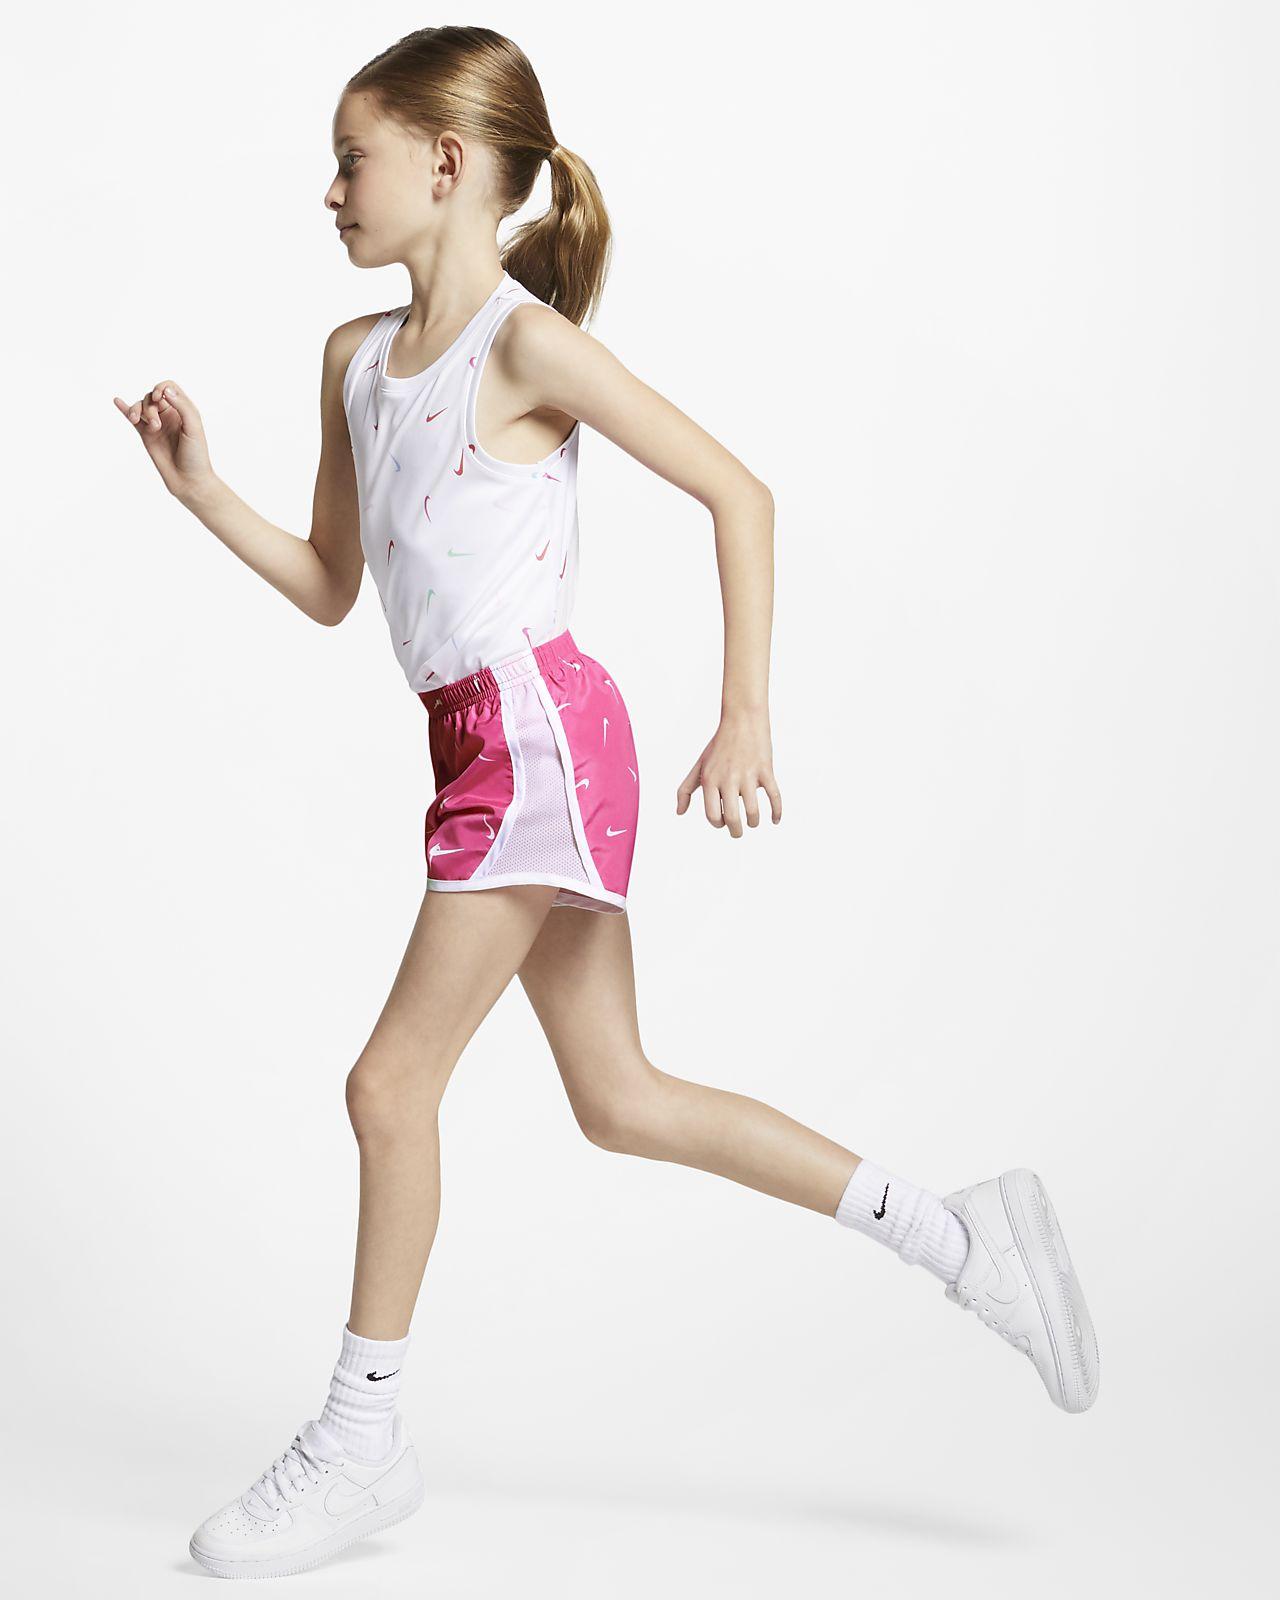 276975f7a9 Nike Dri-FIT Tempo Little Kids' Printed Shorts. Nike.com